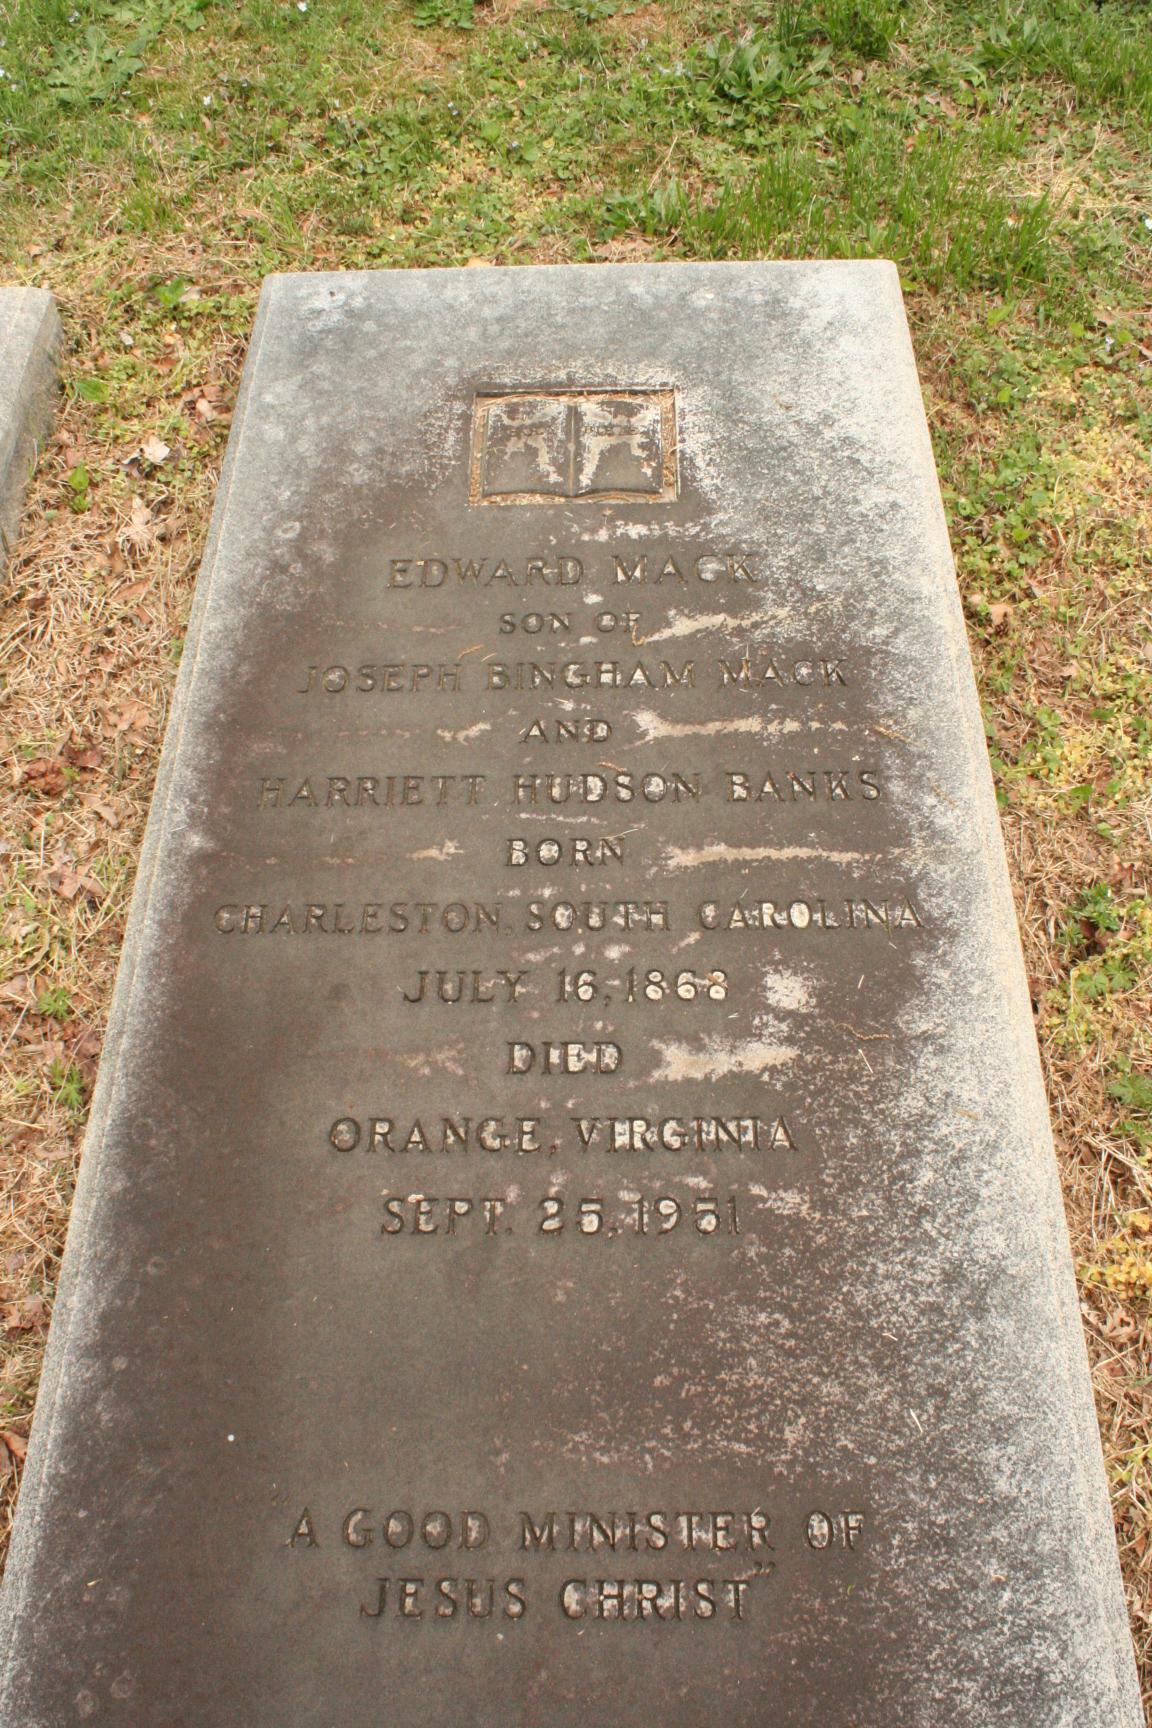 Edward Mack, Sr. is buried at Hollywood Cemetery, Richmond, Virginia.